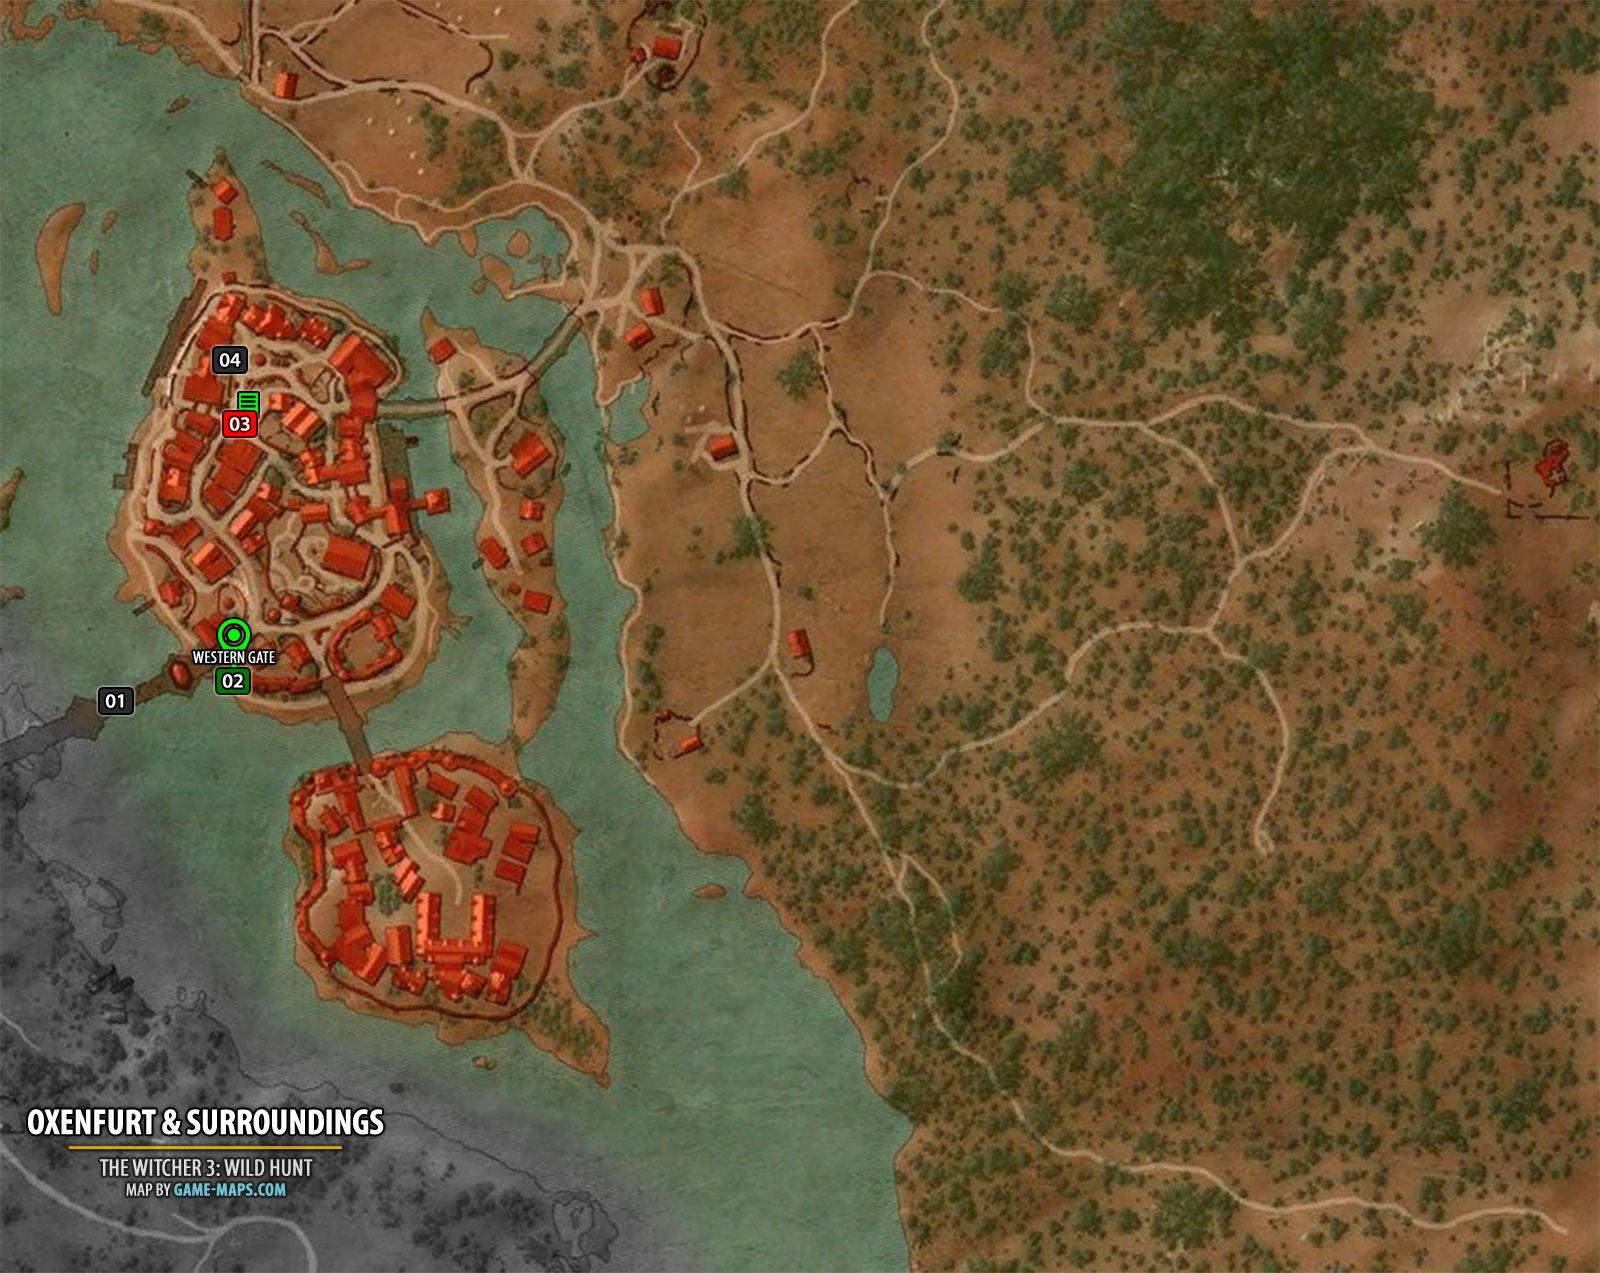 Oxenfurt Surroundings Map The Witcher 3 Walkthrough Maps Gam